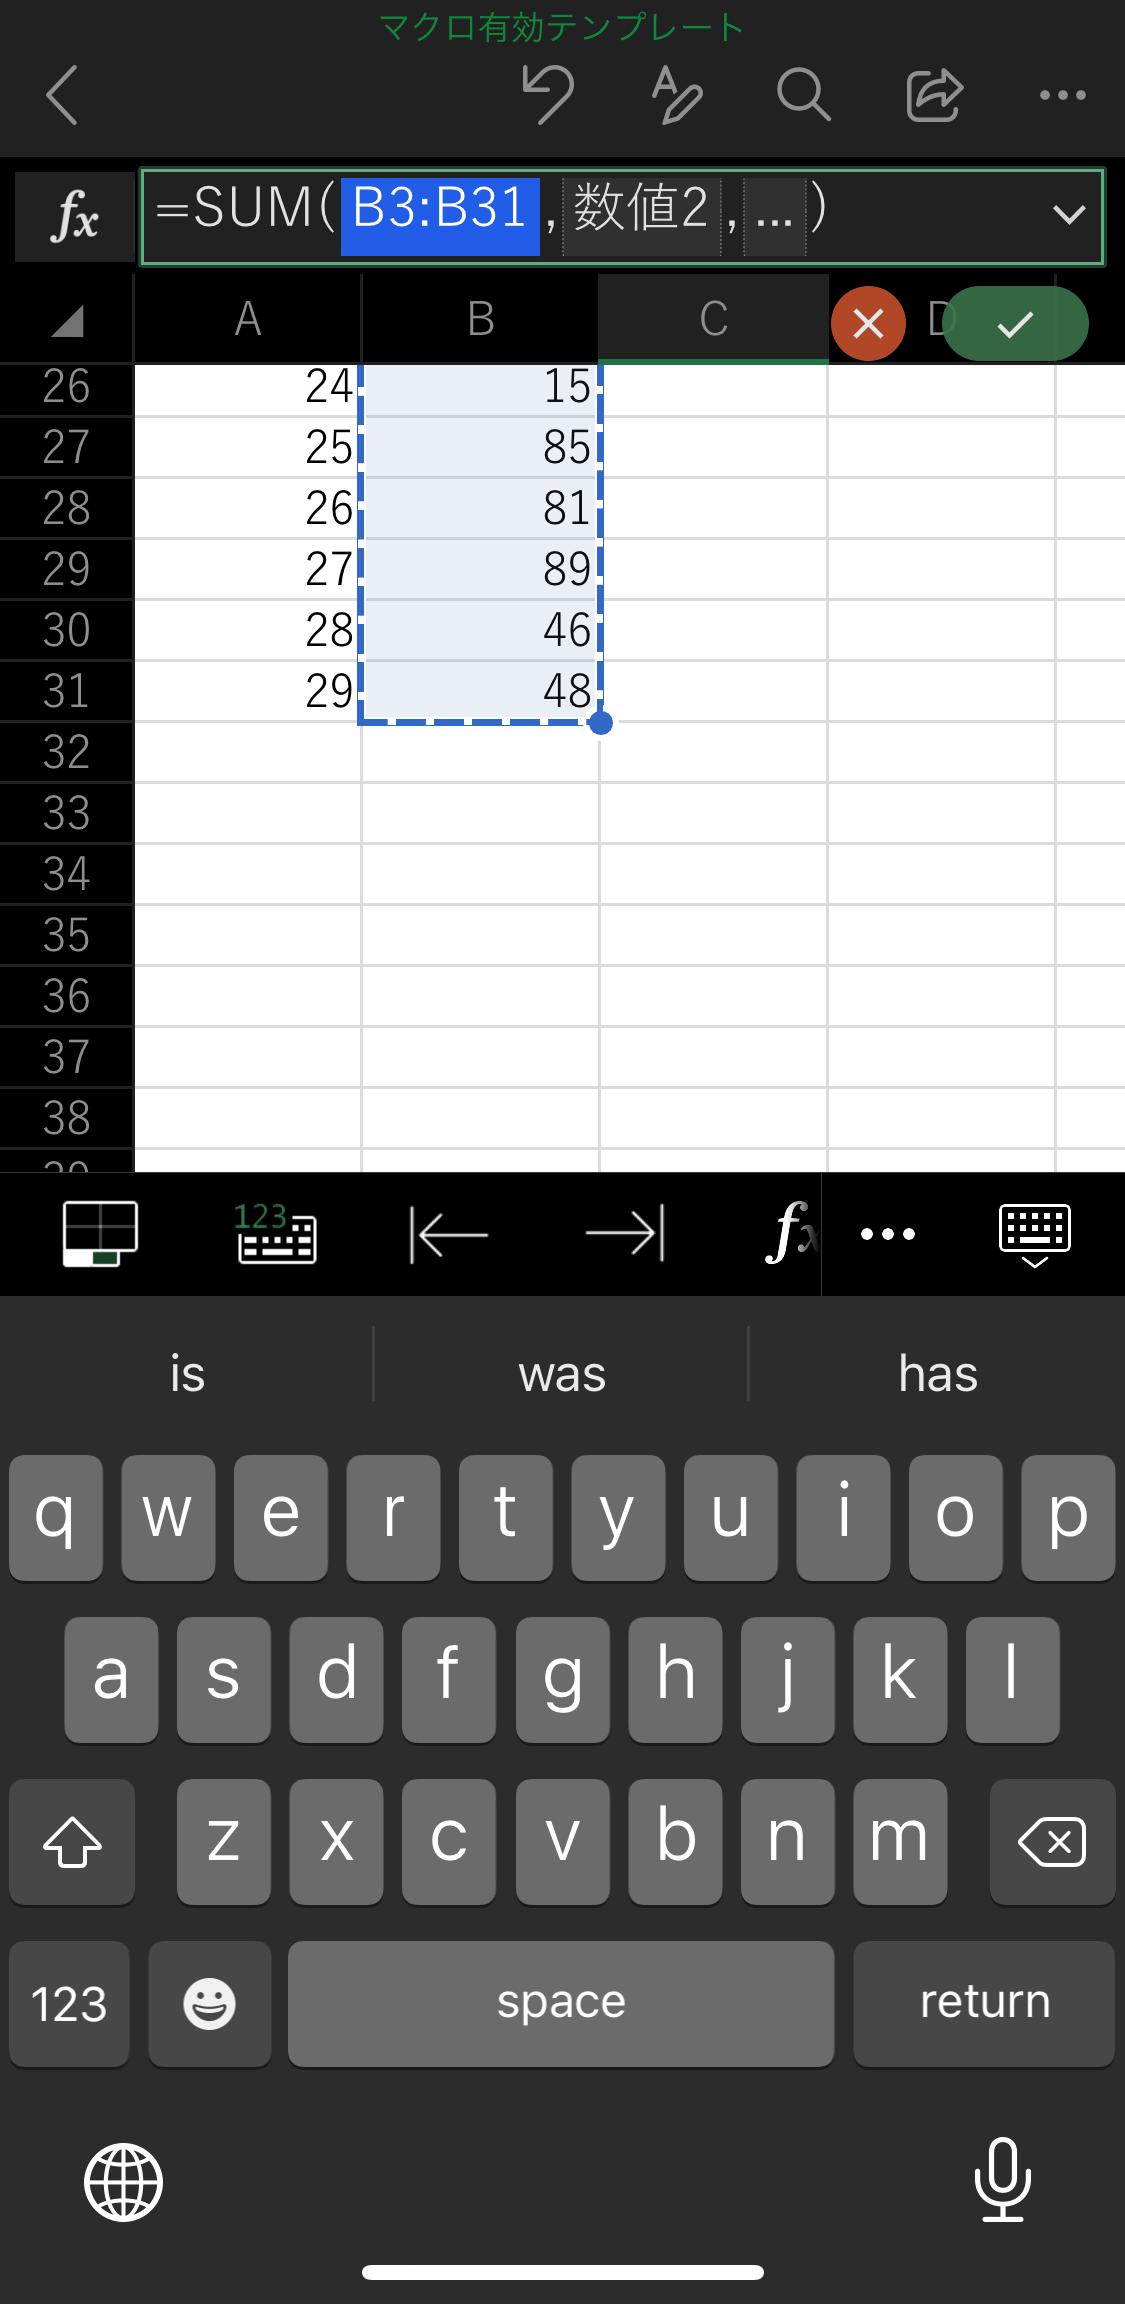 iPhoneでのエクセルアプリの使い方・編集方法・保存方法17